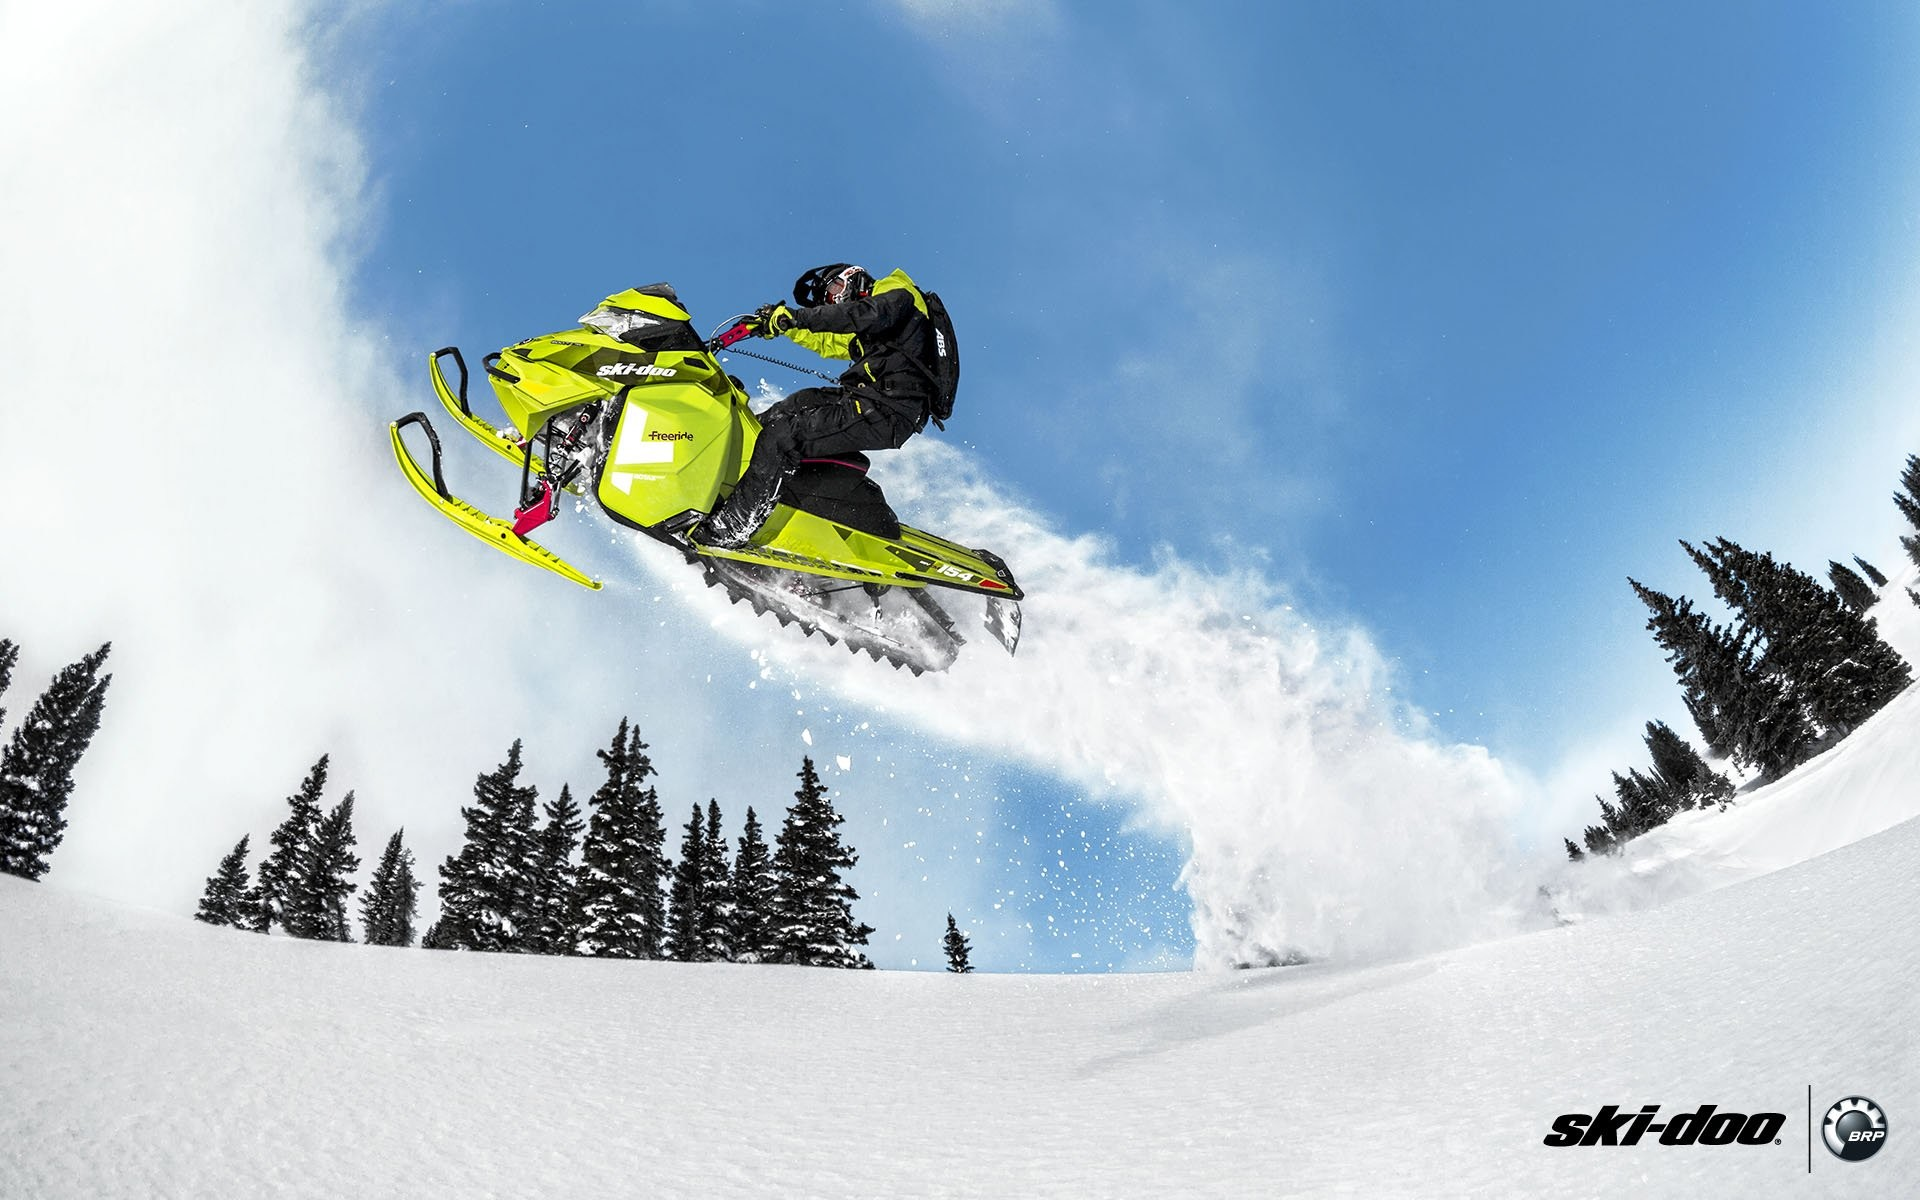 ski doo wallpaper  Ski Doo Wallpaper (60  images)